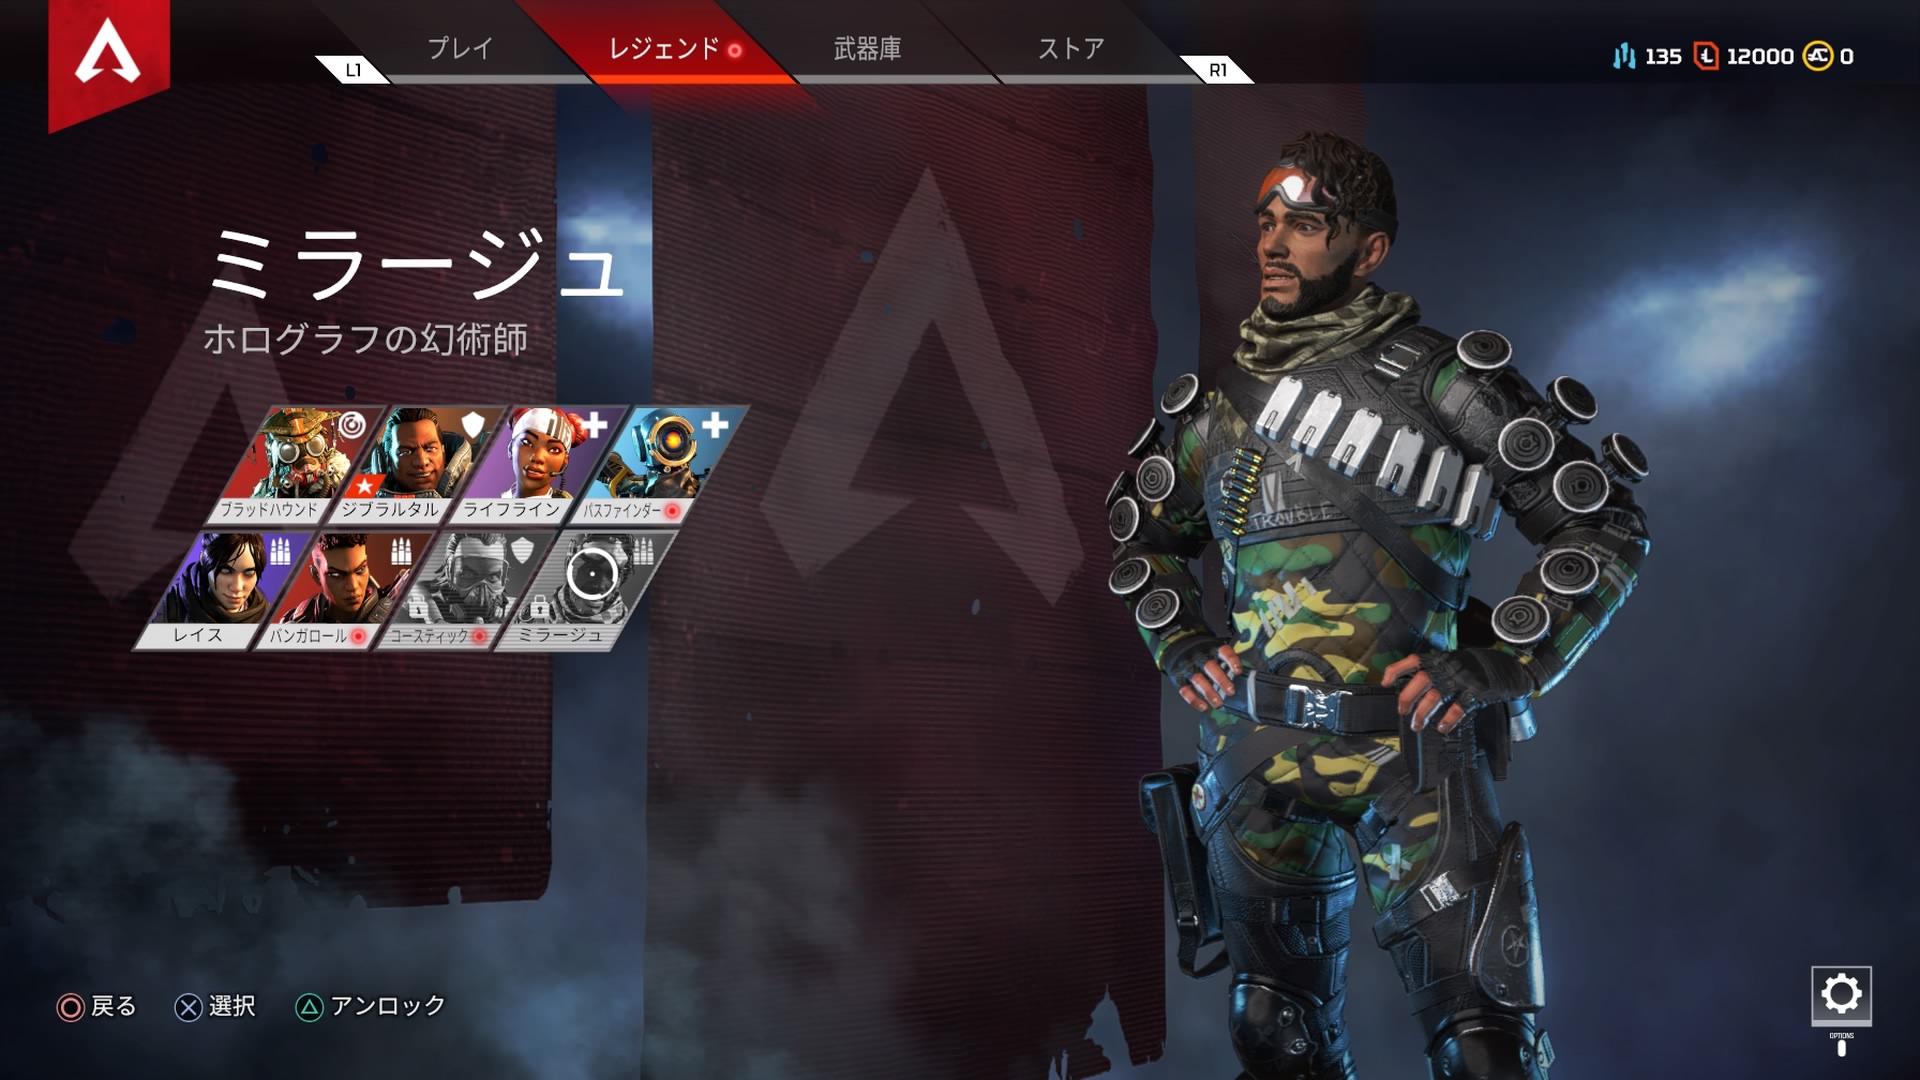 Apex Legends 最強キャラクターランキング エーペックスレジェンズ ゲシピ